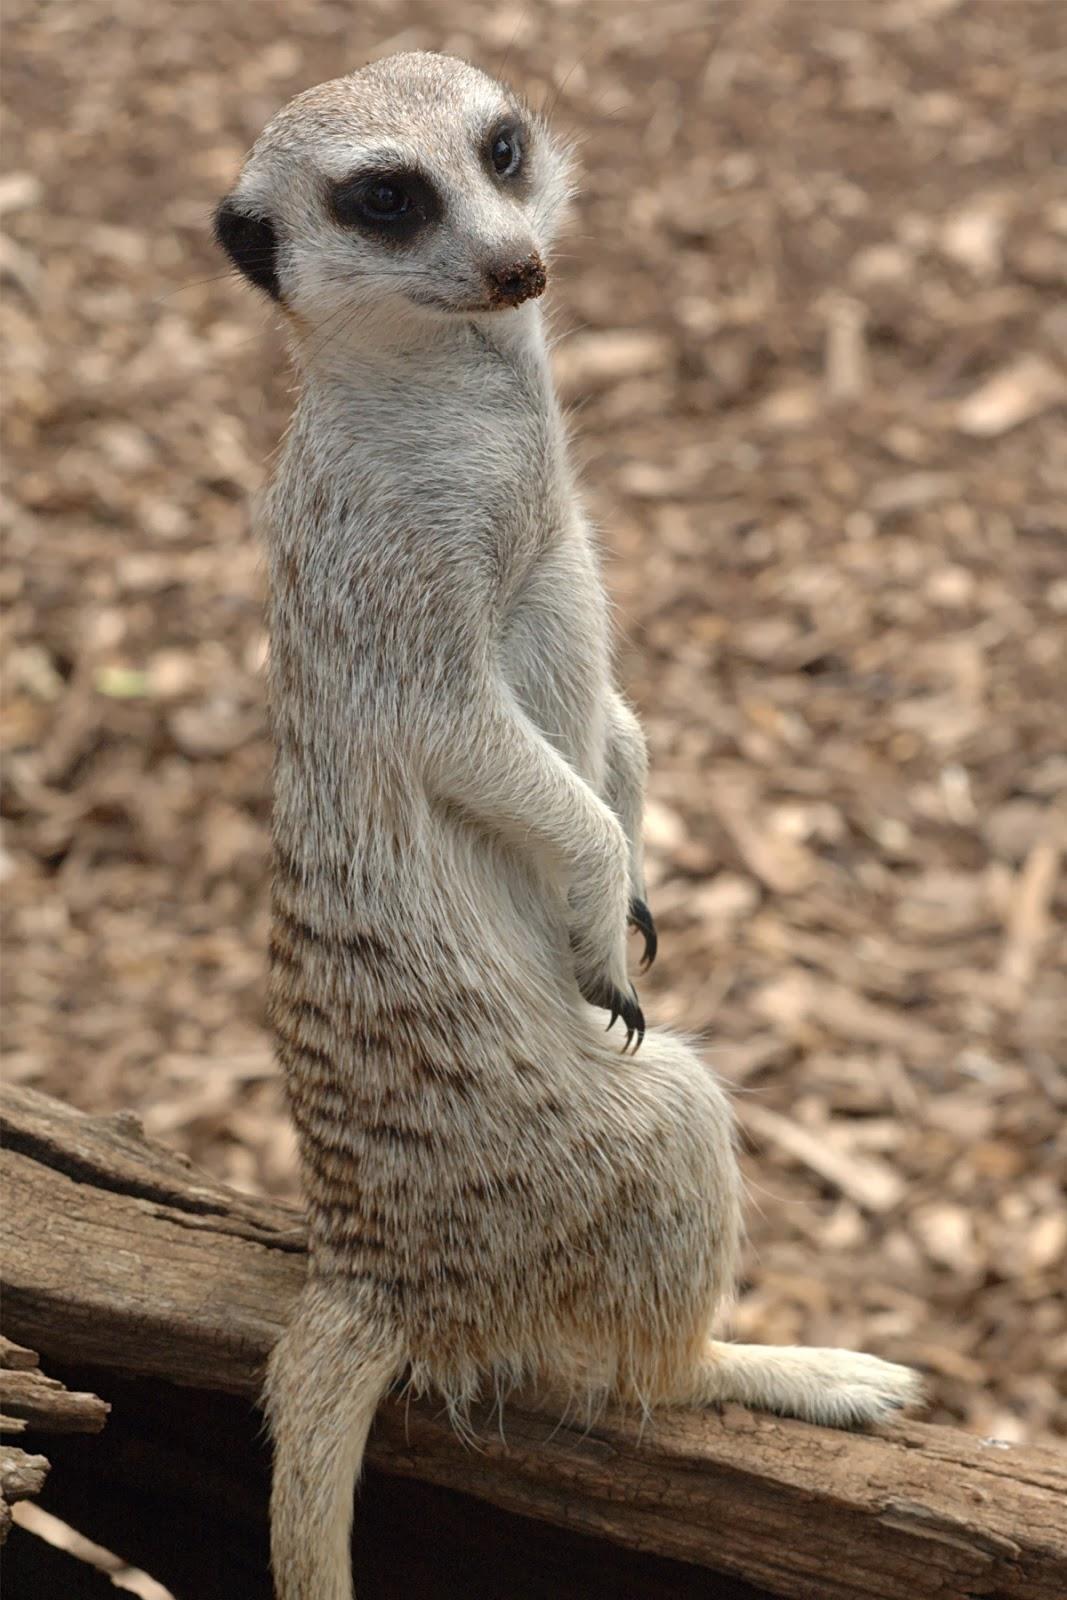 Meerkat Hd Wallpapers Hd Wallpapers High Definition